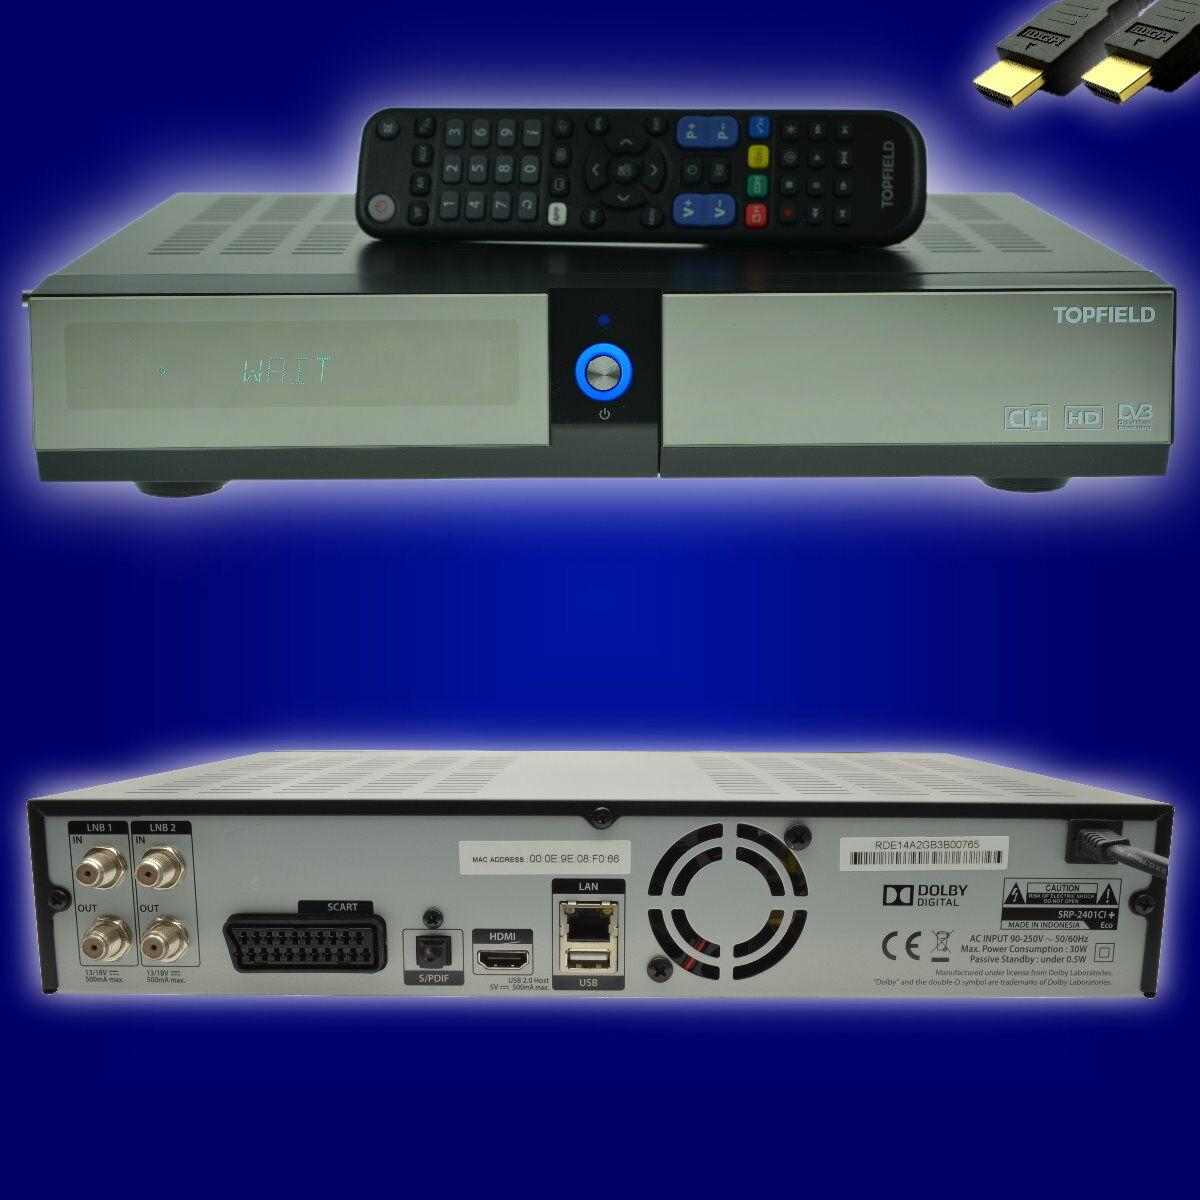 Topfield SRP-2401 Eco CI+ 500GB HDTV  Twin Sat Receiver mit Festplatte